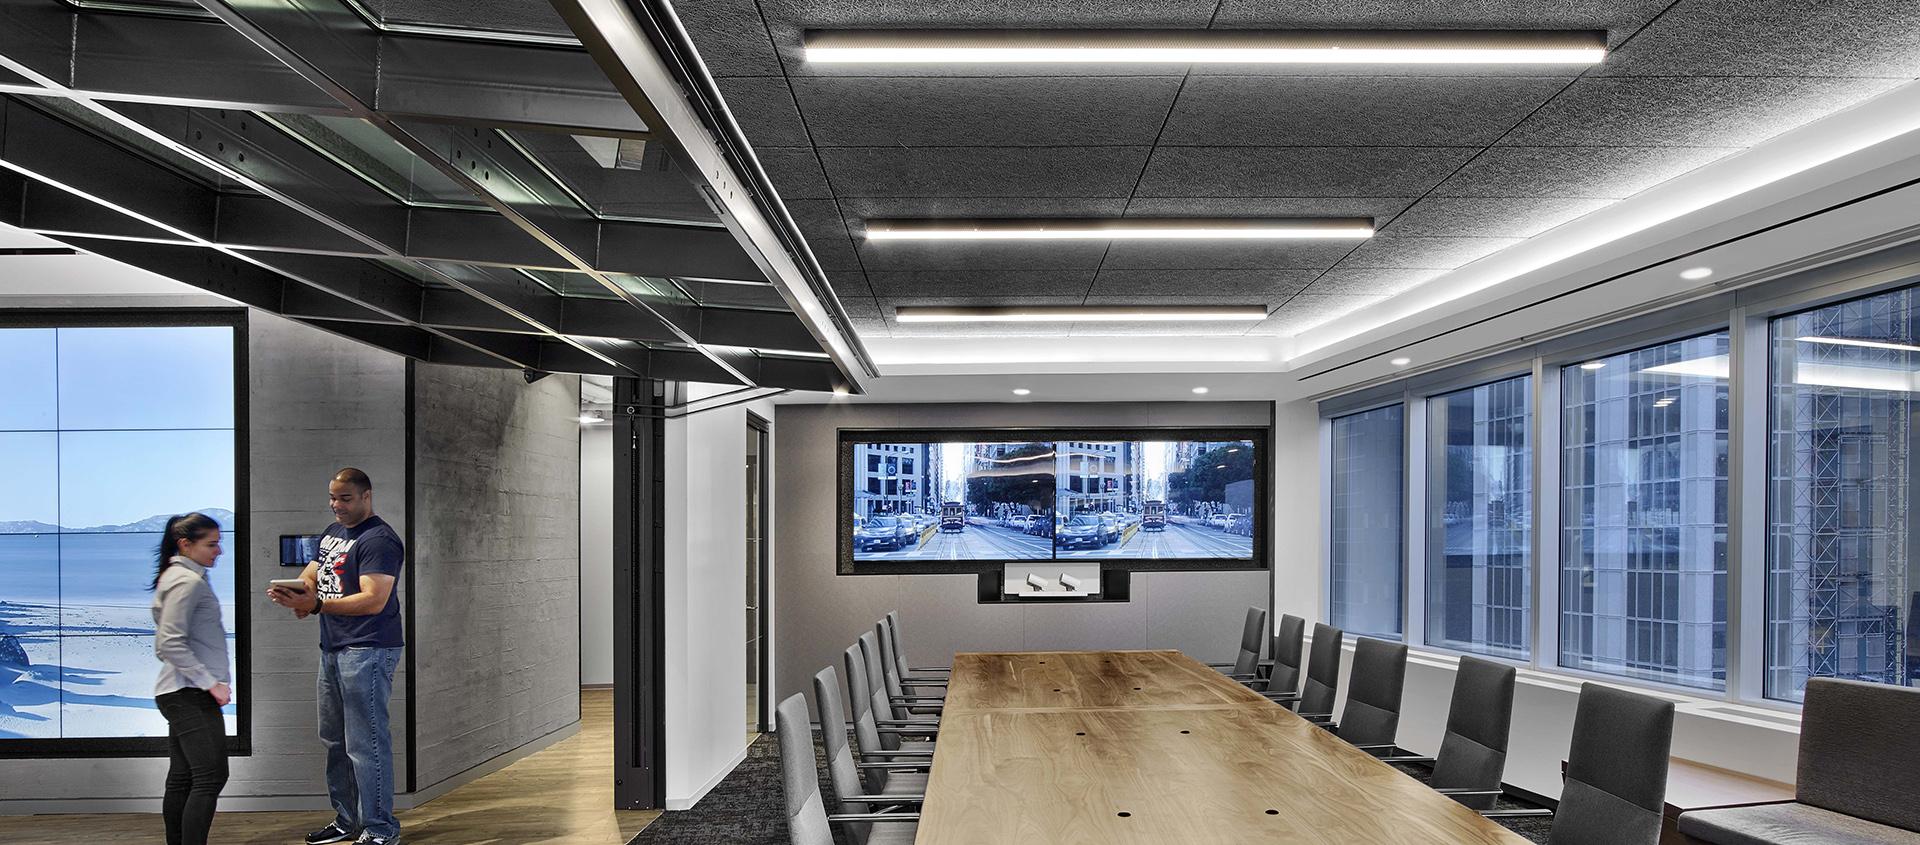 Blackstone Renlita S conference room divider Operable